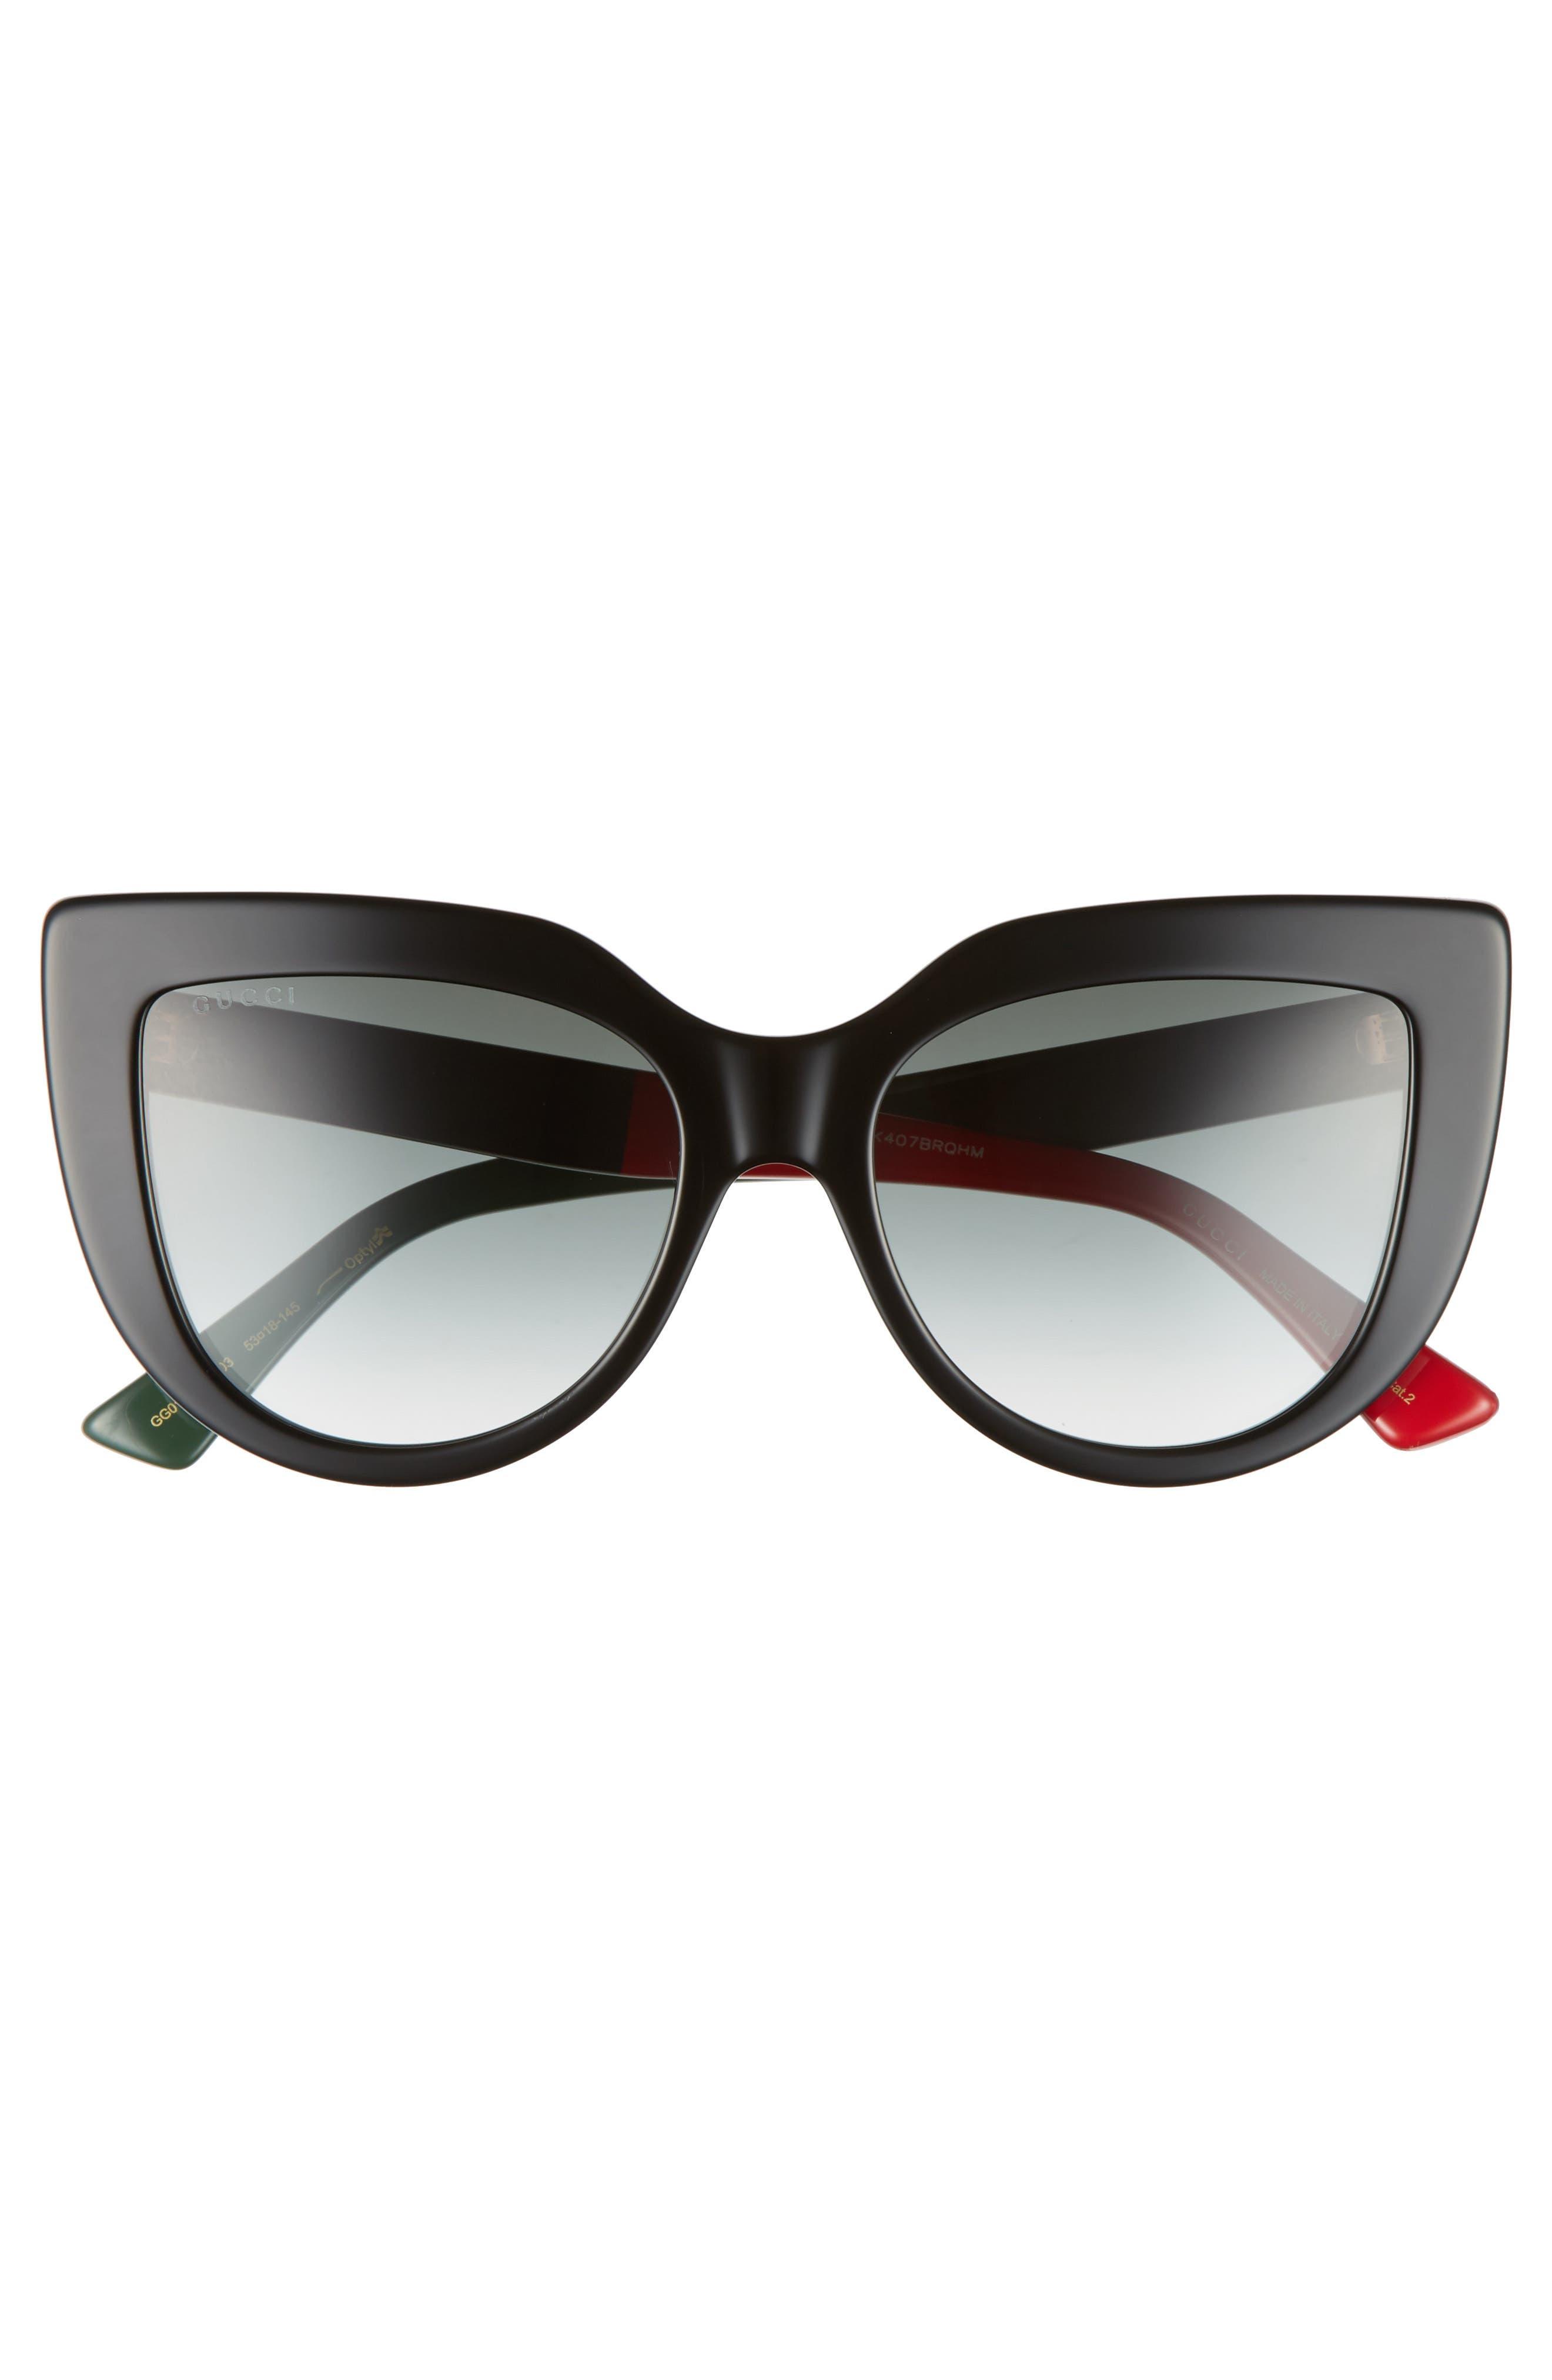 53mm Cat Eye Sunglasses,                             Alternate thumbnail 3, color,                             BLACK